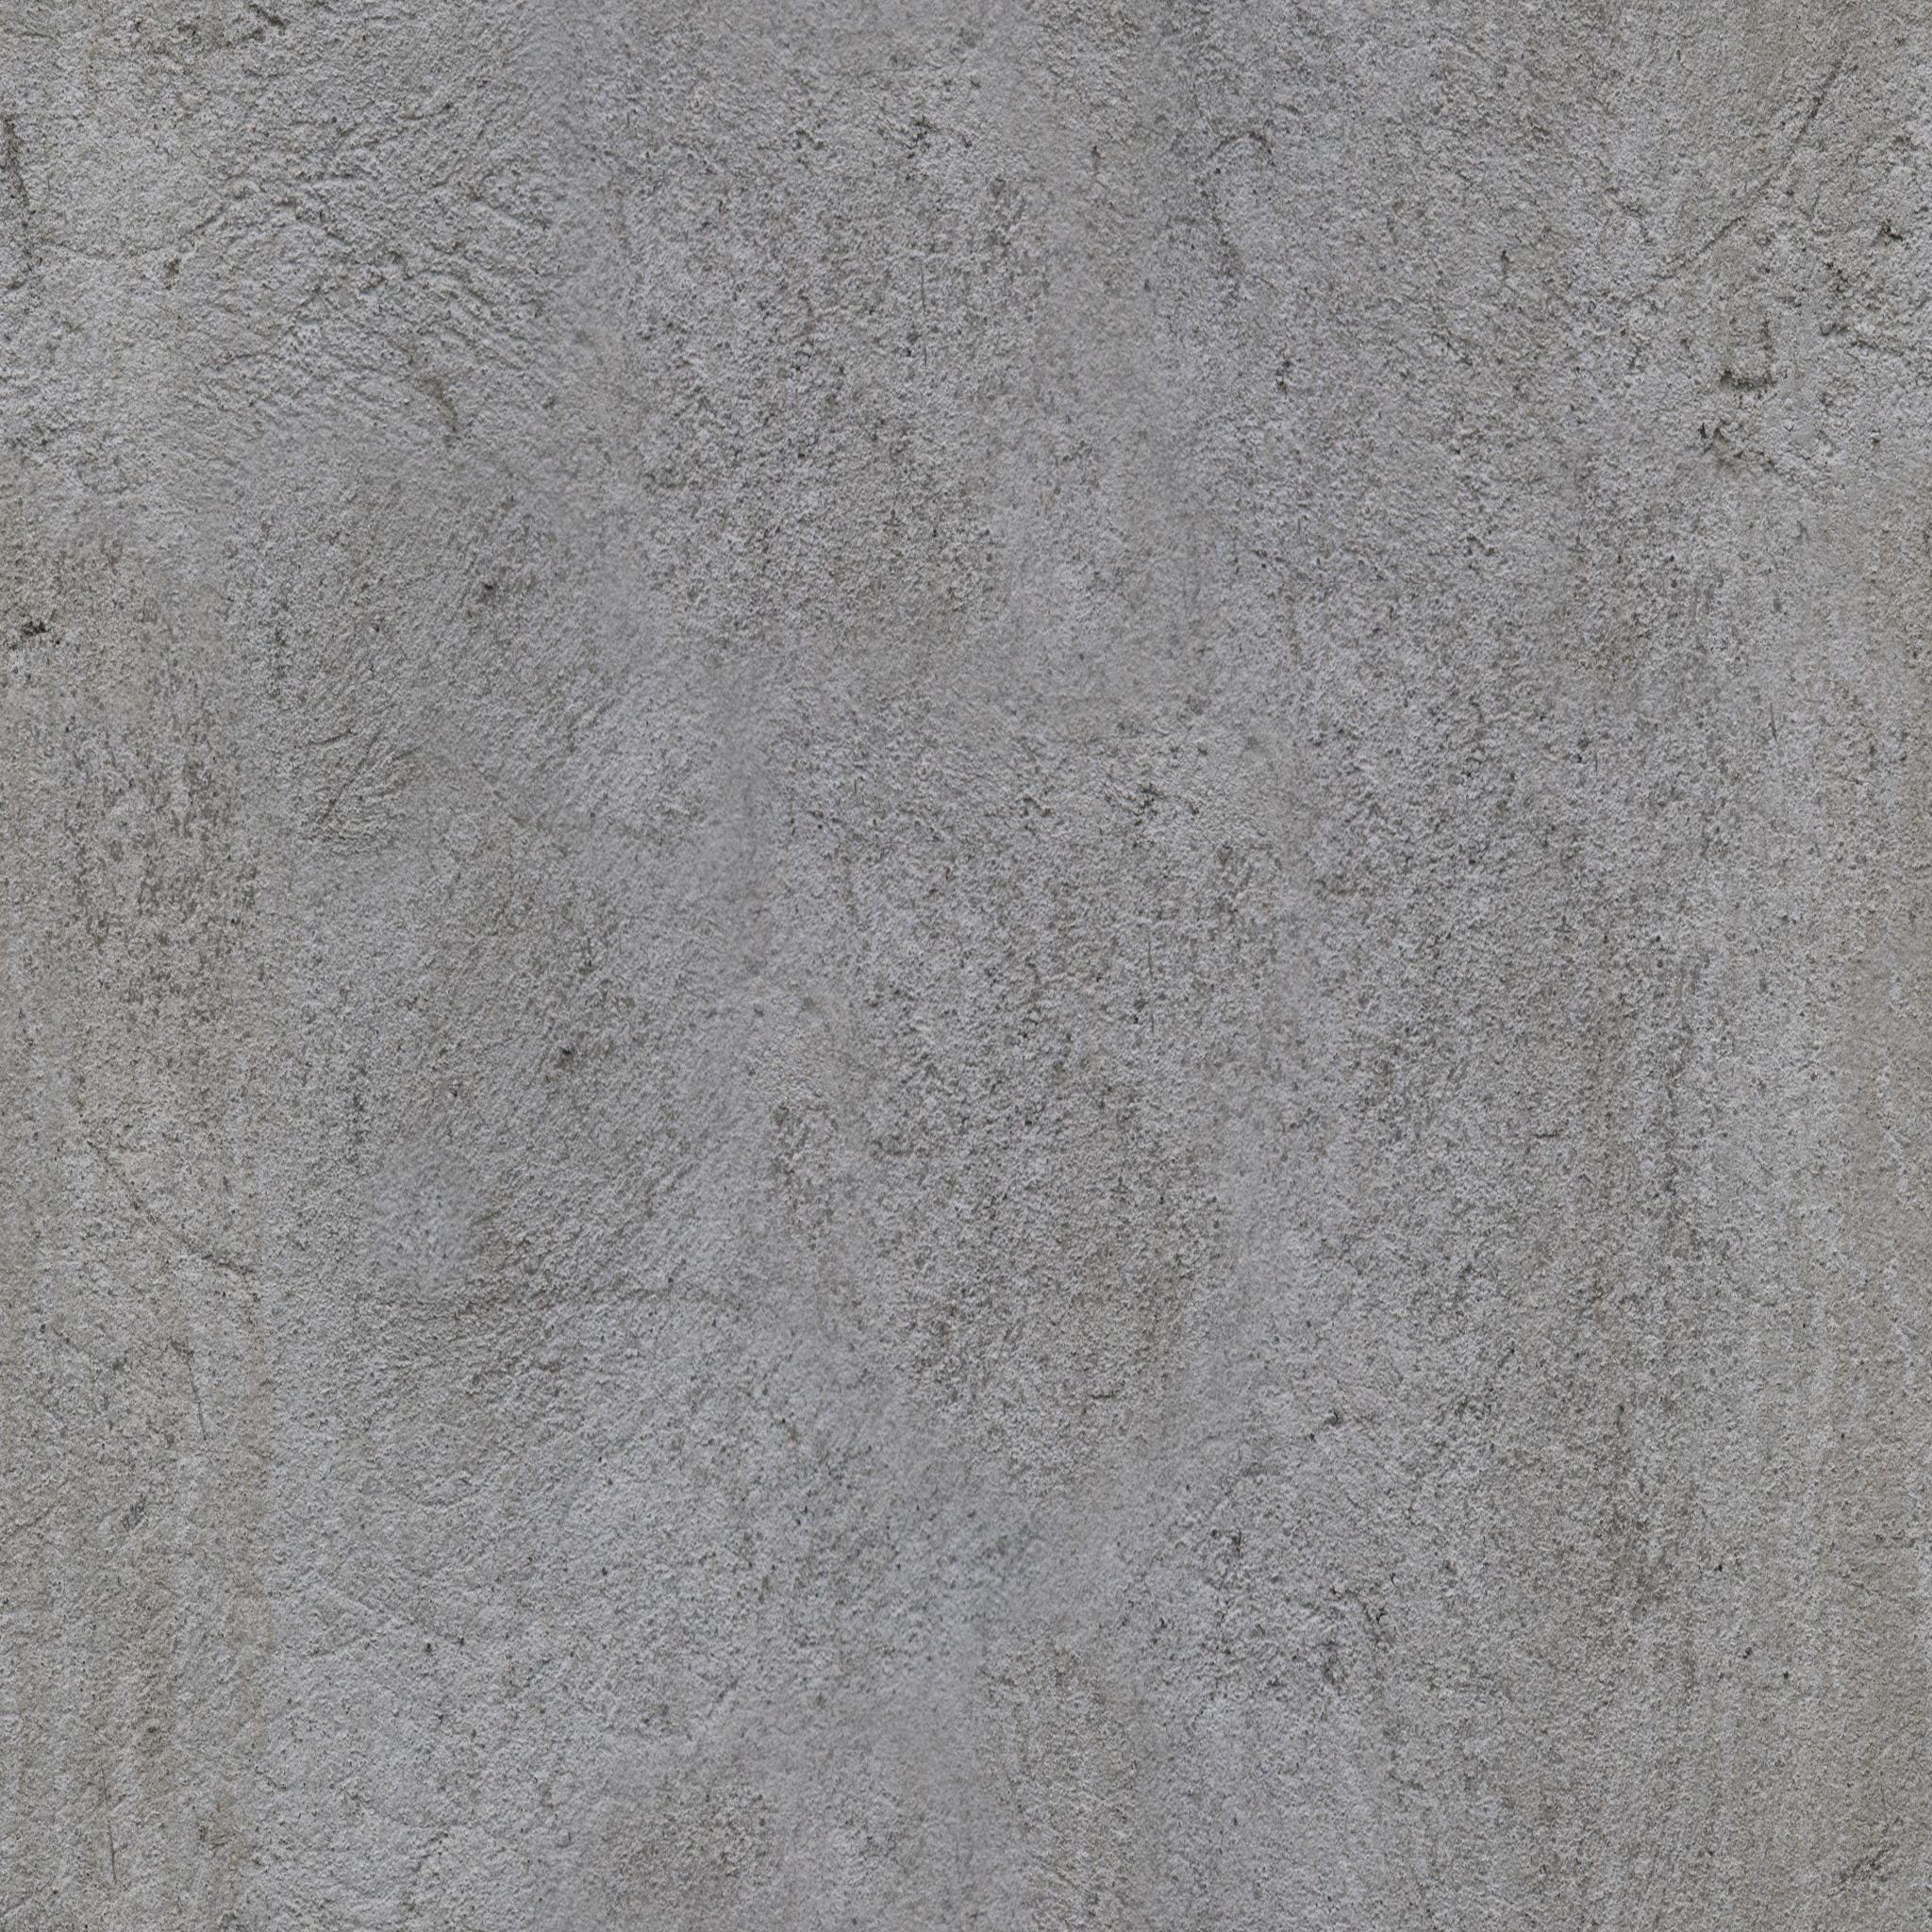 Dark Gray Smooth Concrete.jpg